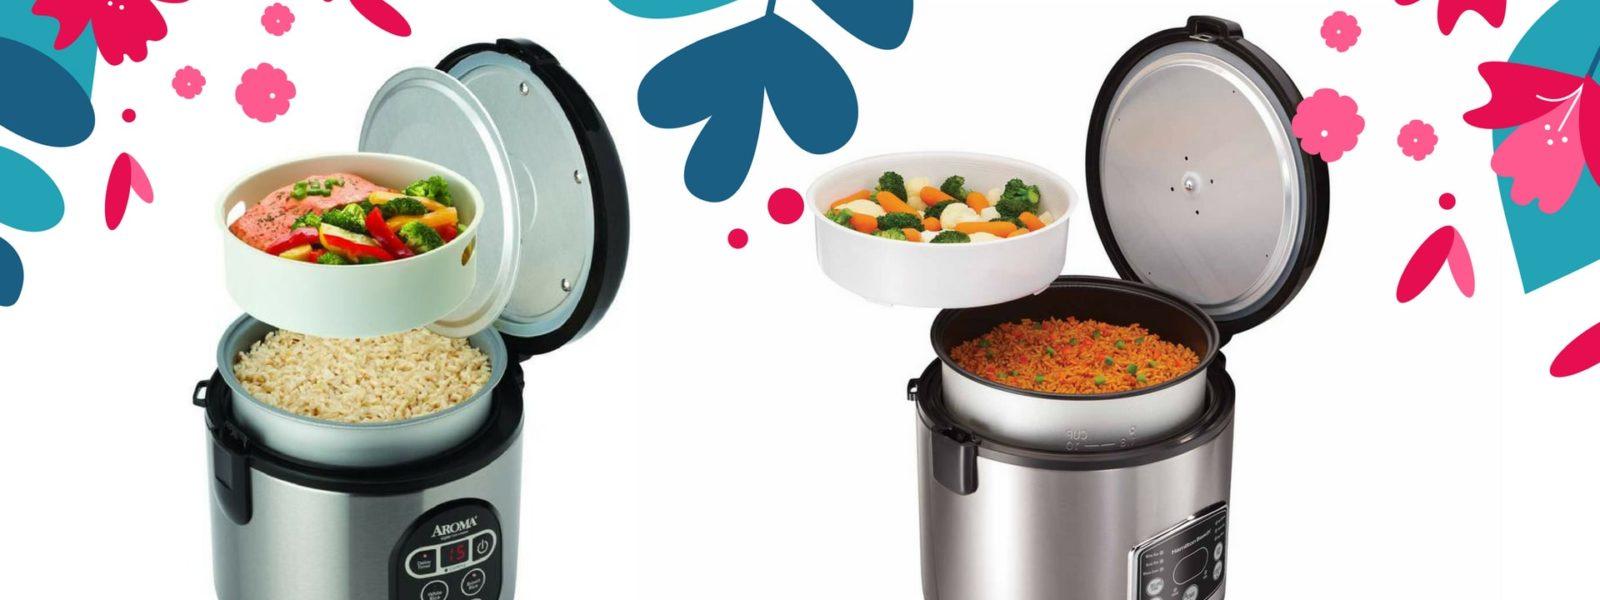 Autocuiseur riz ou Rice Cooker : Test & Avis 2018